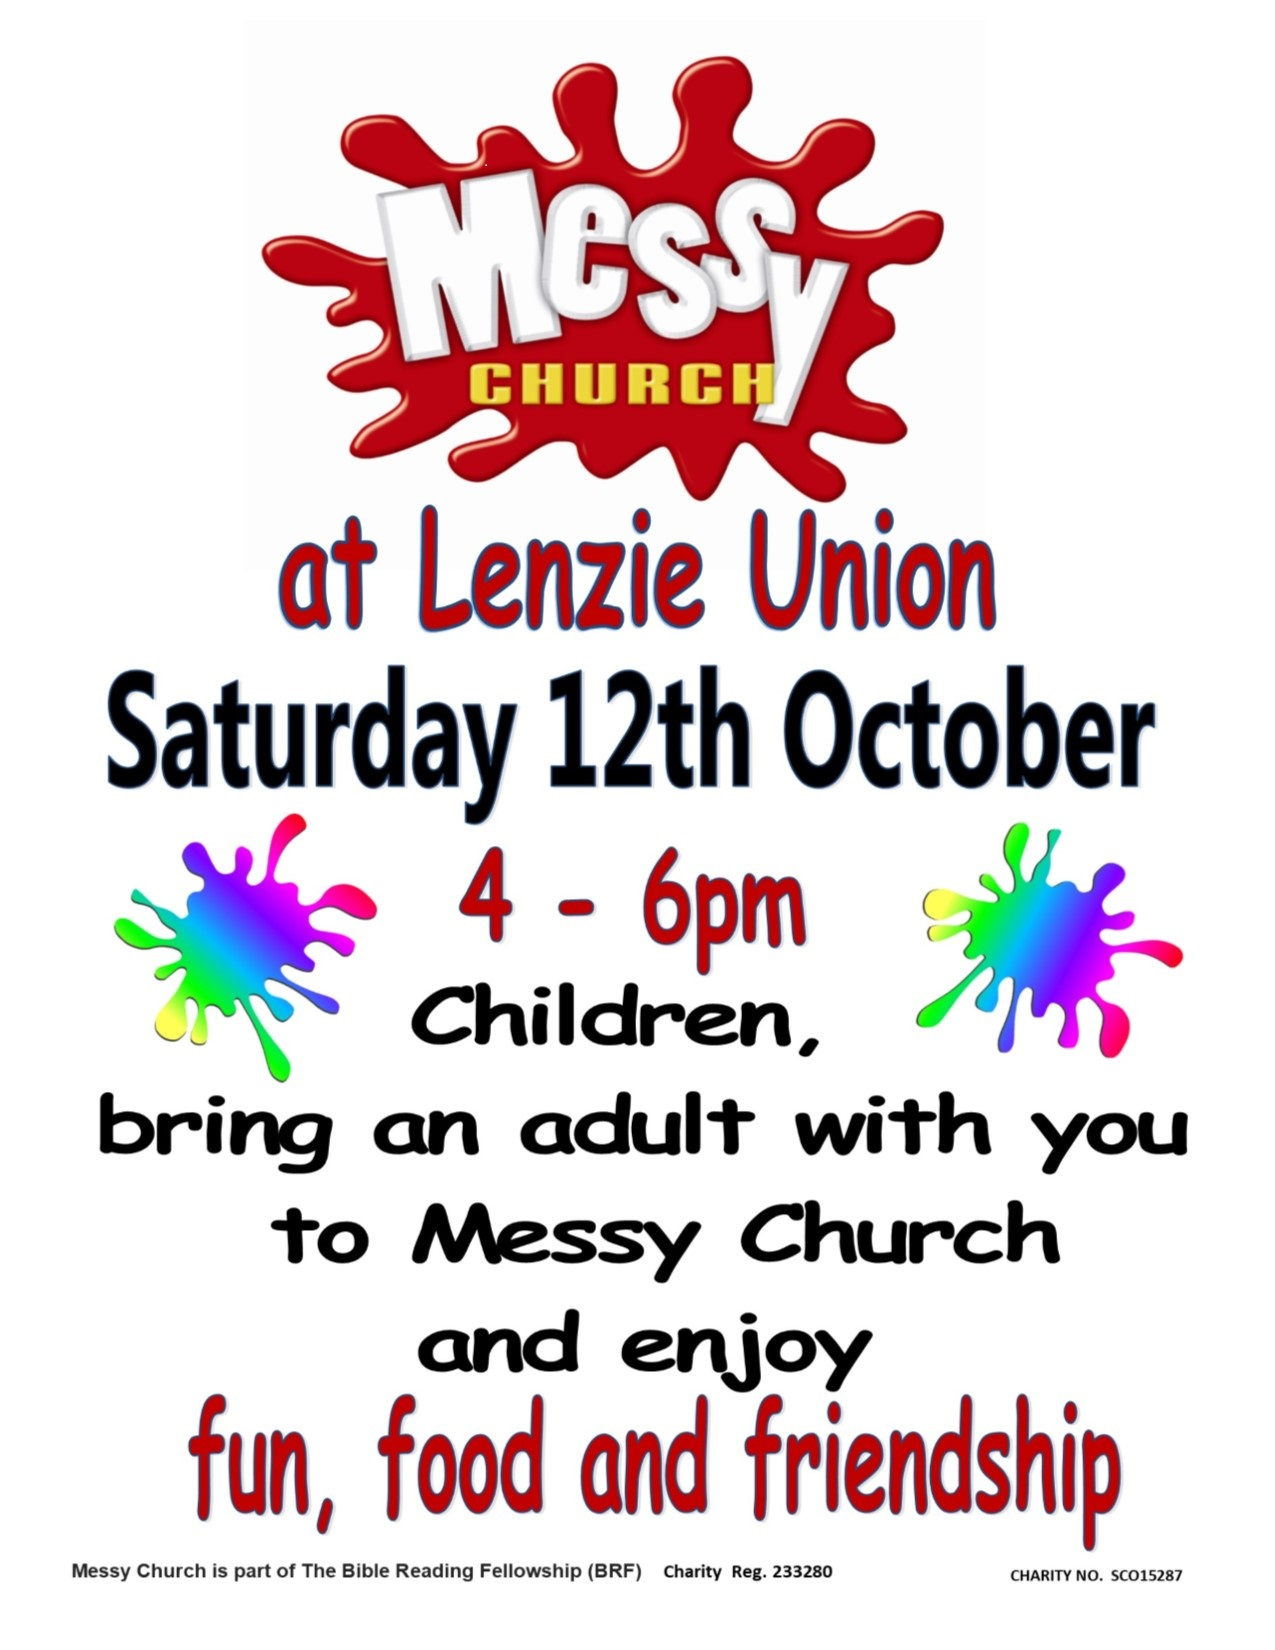 http://www.lenziecommunitycouncil.org.uk/wp-content/uploads/2019/10/Messy-Church.jpg